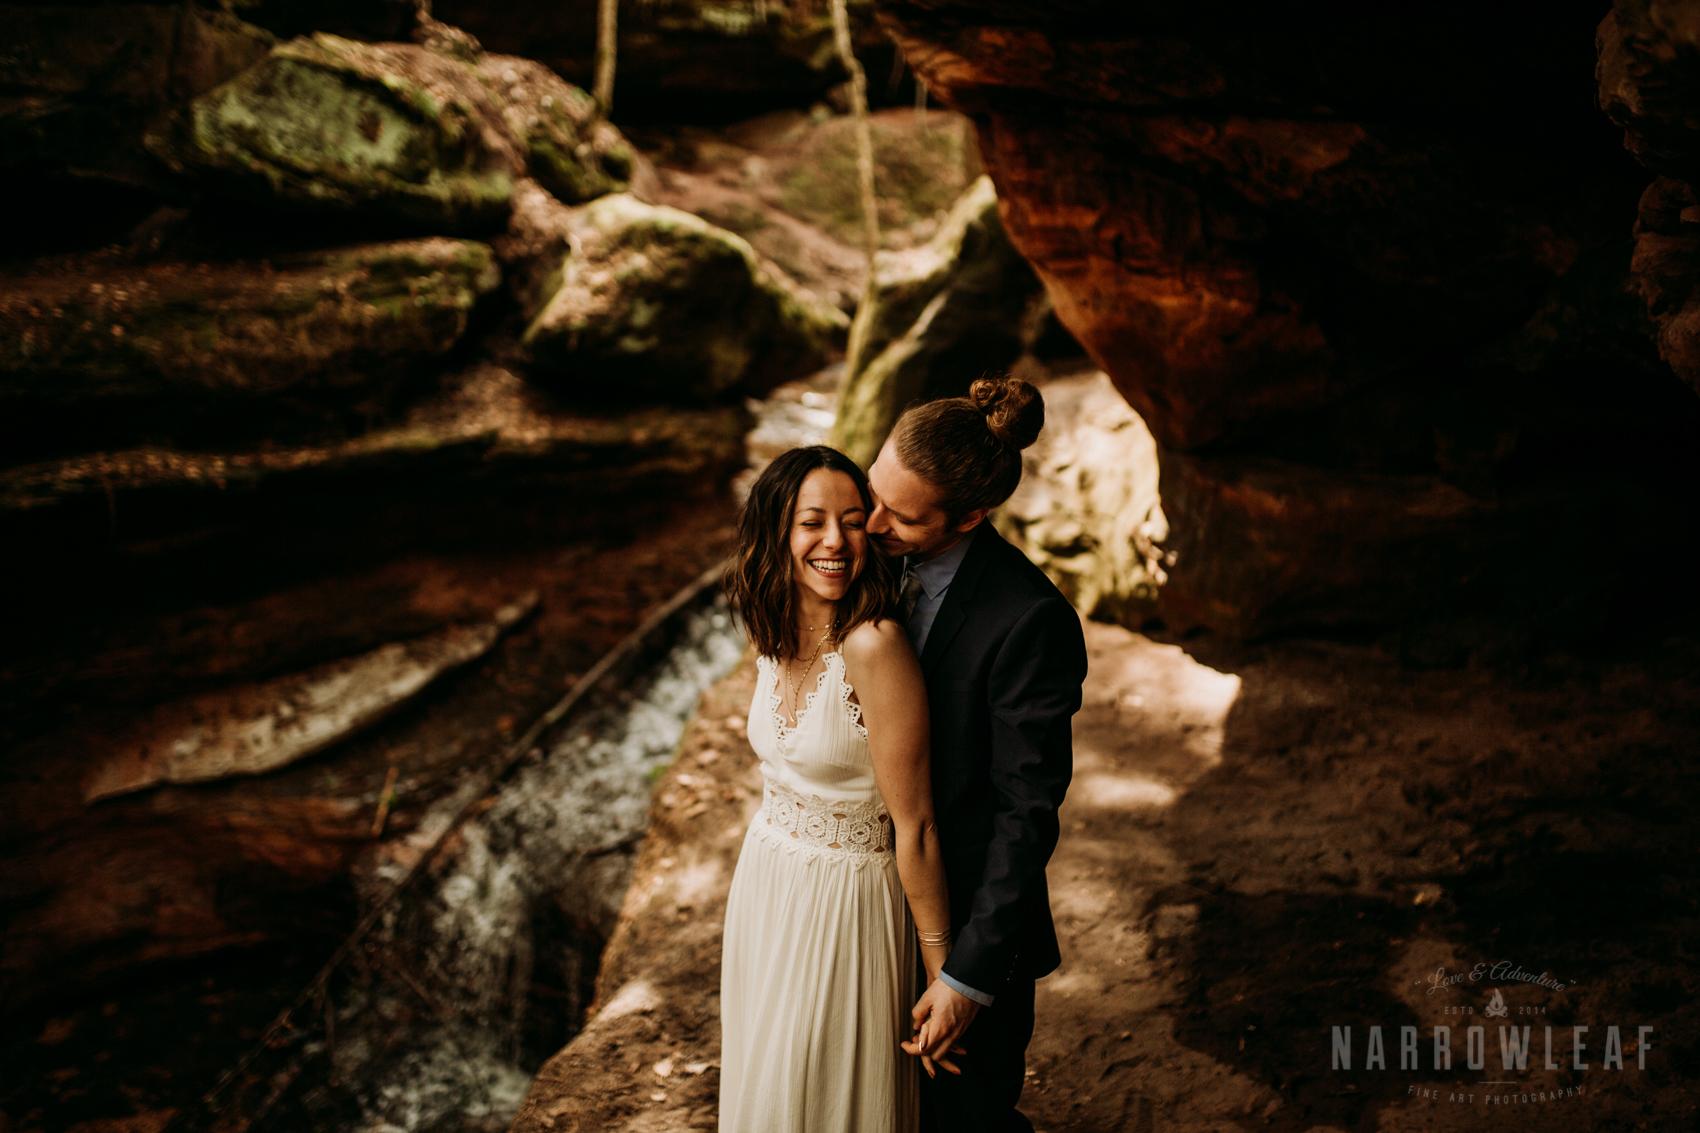 moody-lake-superior-hiking-adventure-elopement-NarrowLeaf-Photography-6849.jpg